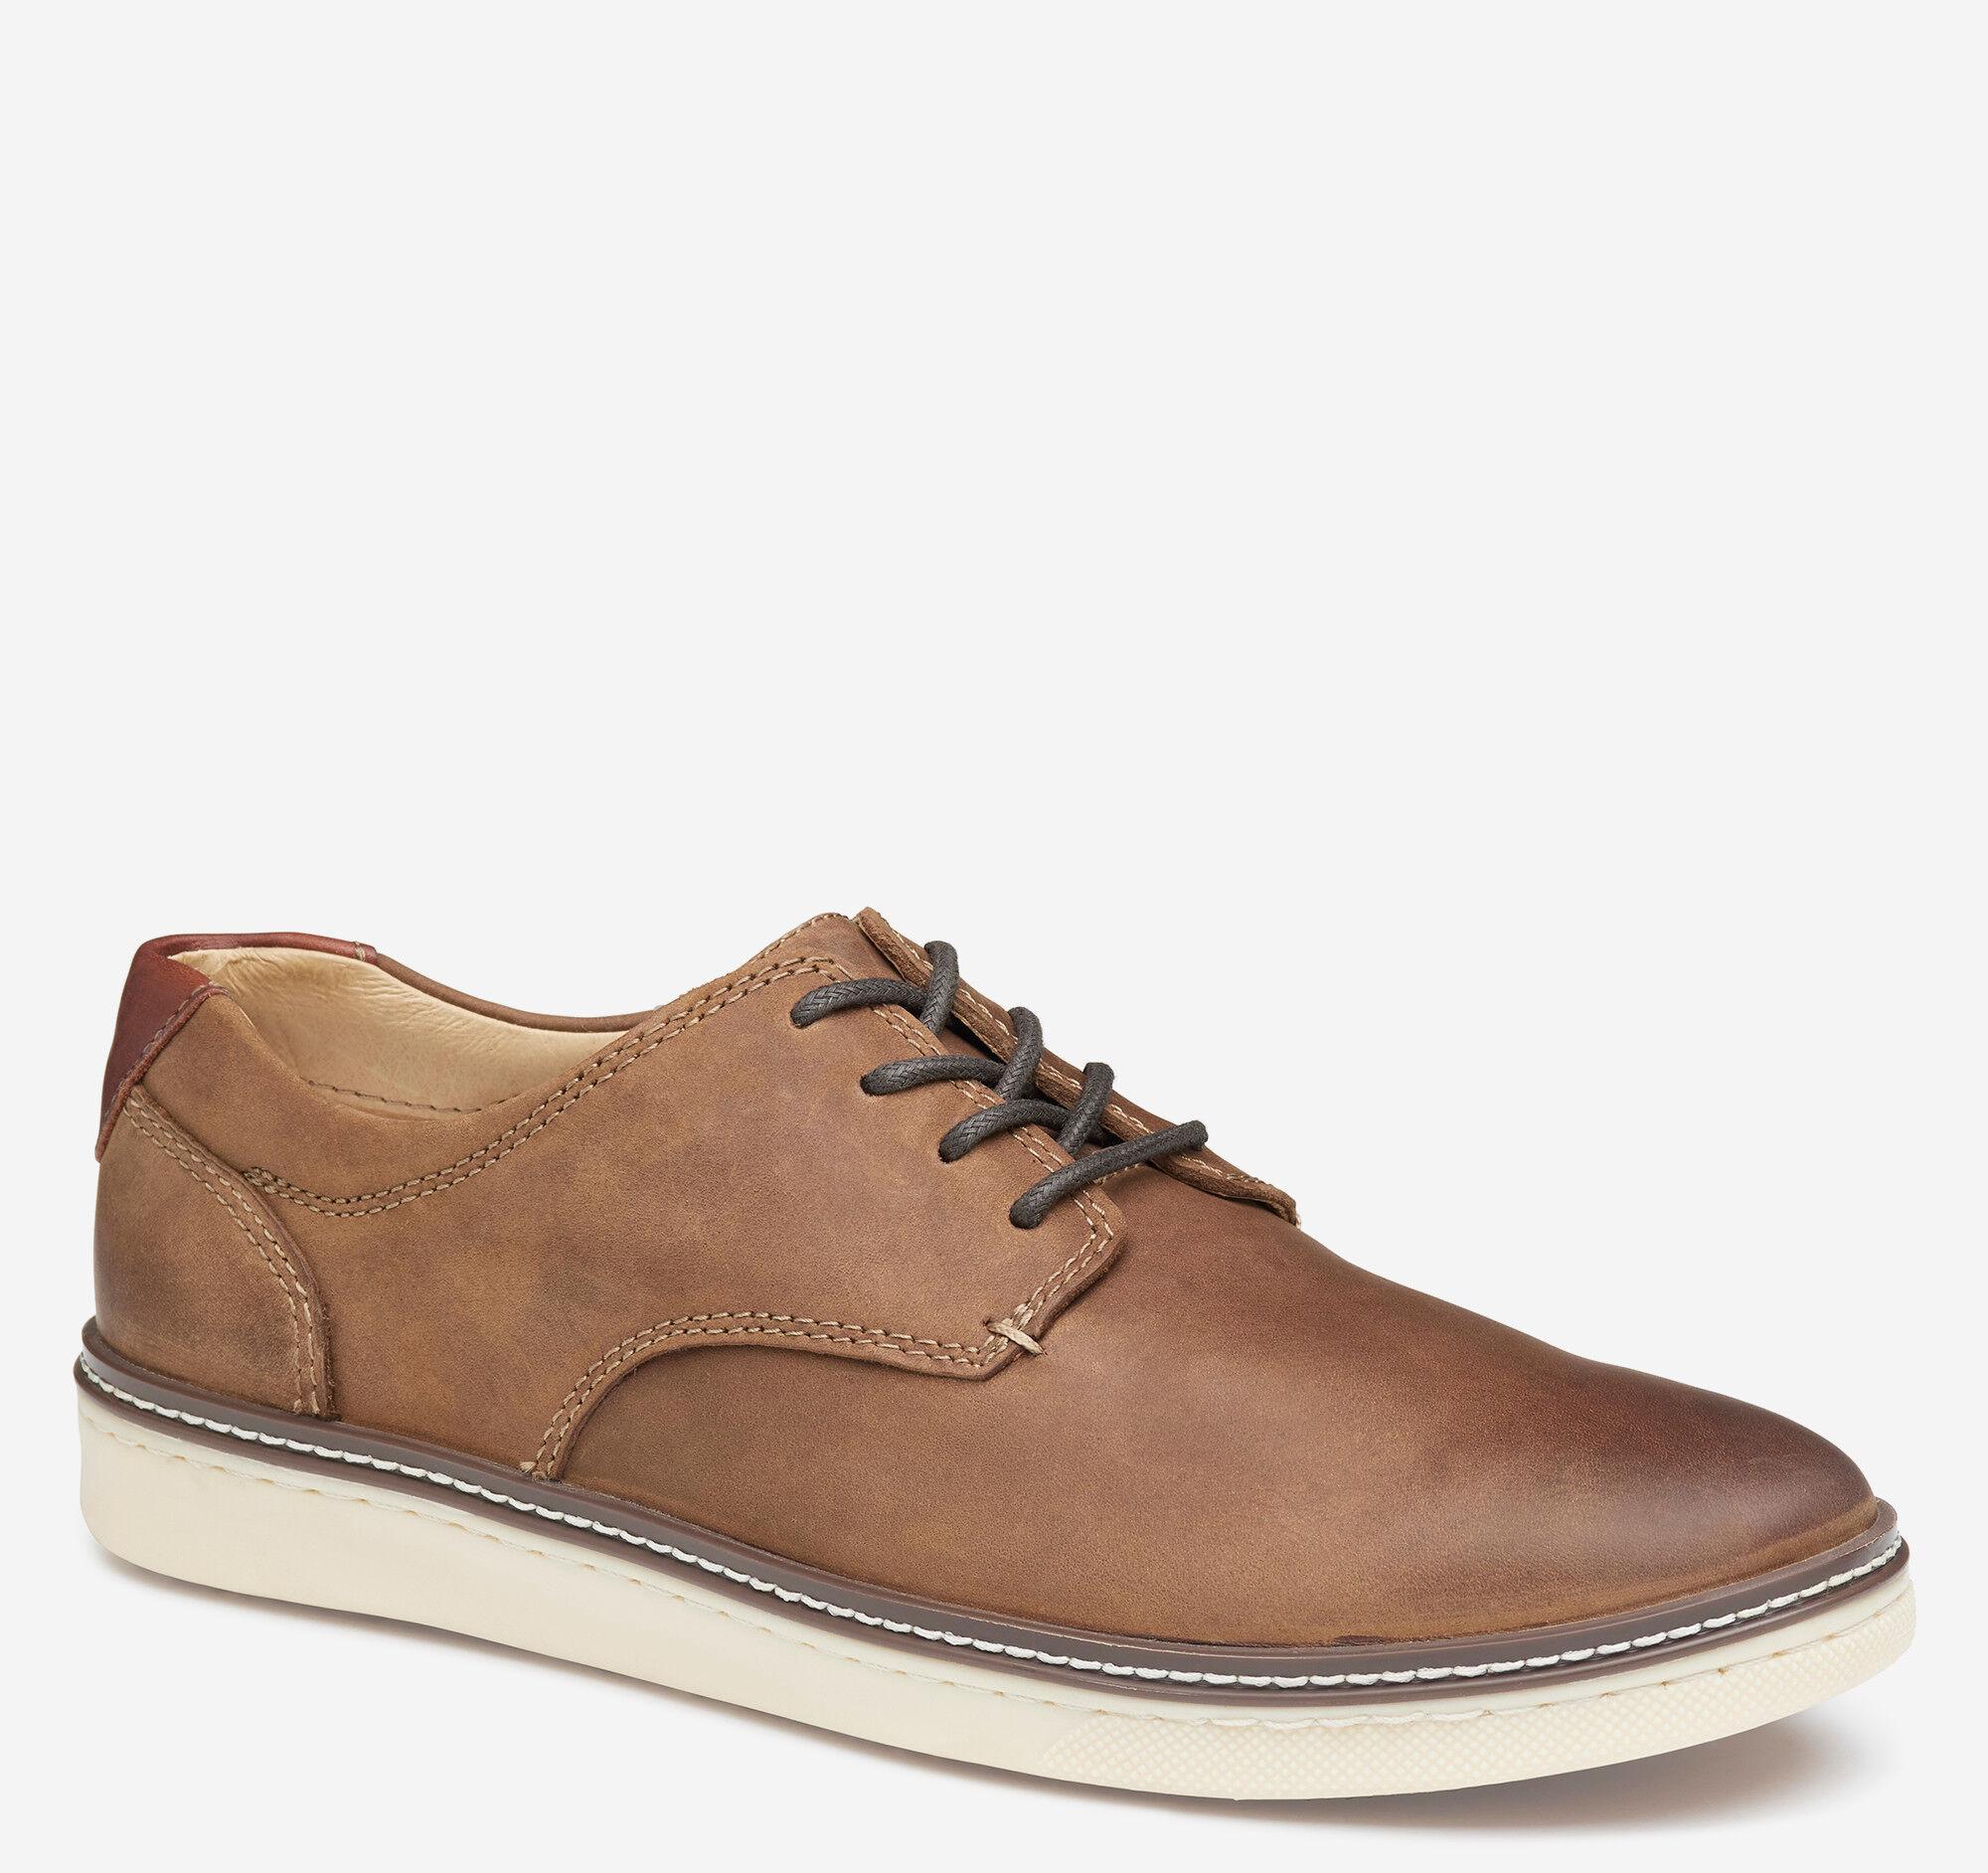 Johnston & Murphy Men's McGuffey Plain Toe Shoe - Tan Oiled Full Grain - Size 10 - M